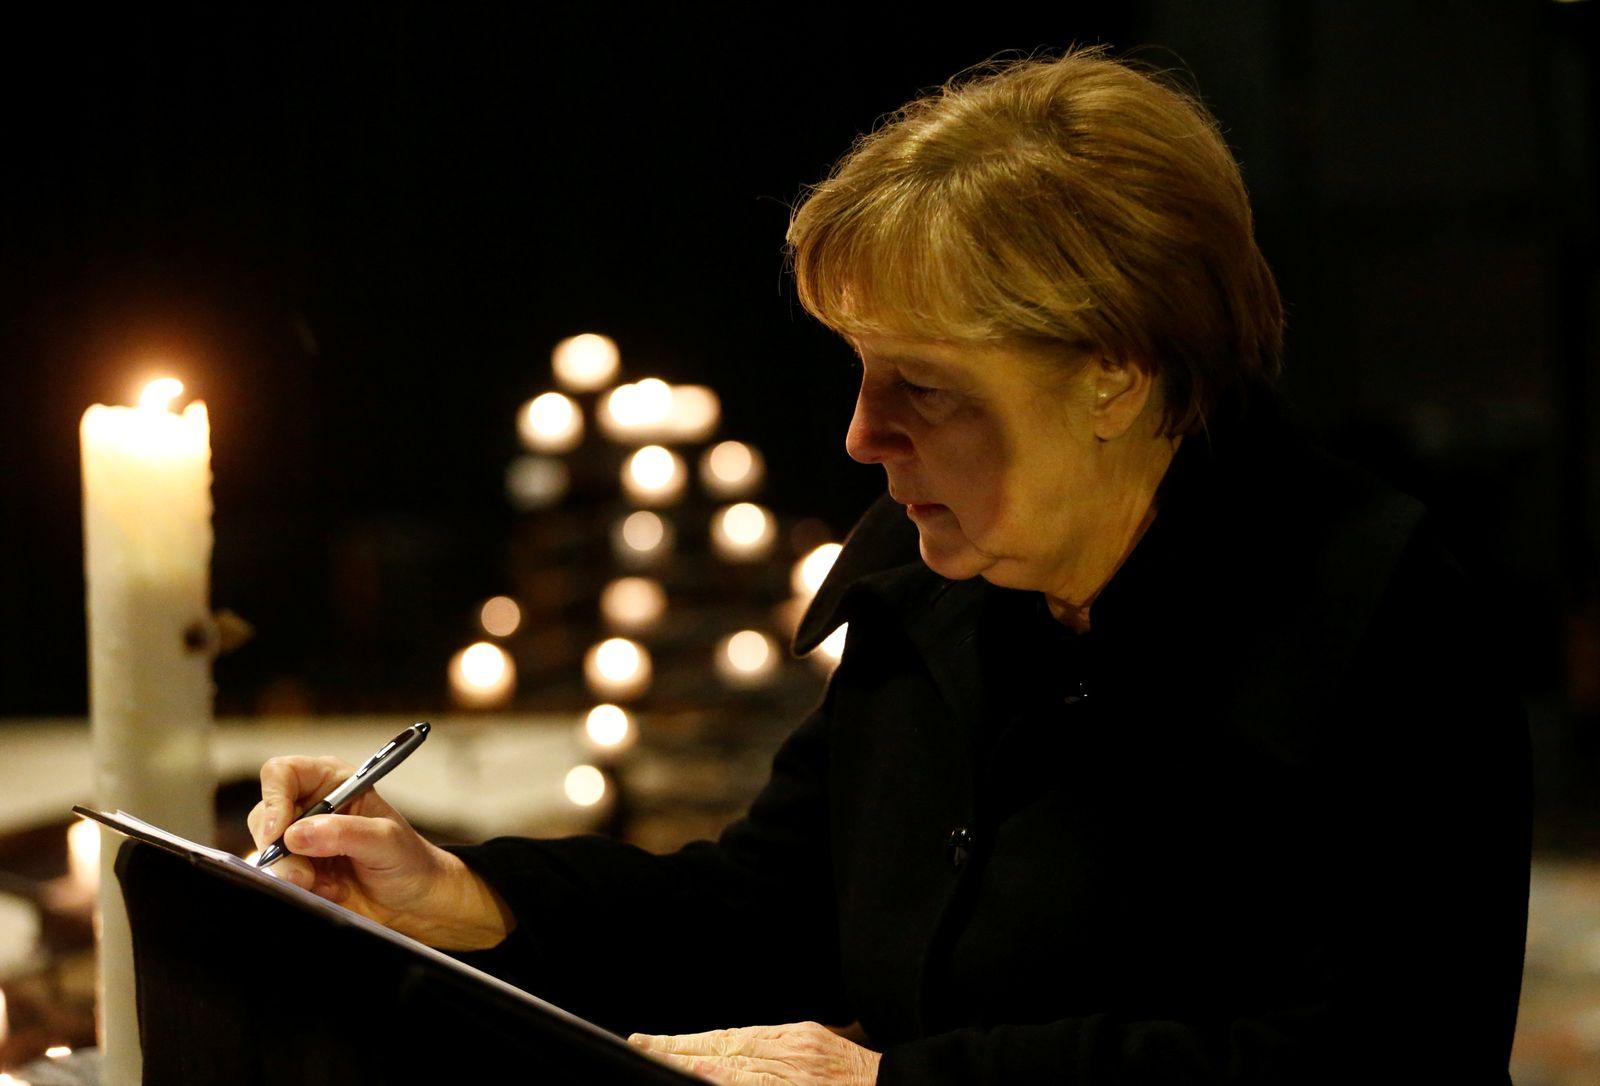 Berlin/ Breitscheidplatz/ Merkel/ Kondolenzbuch